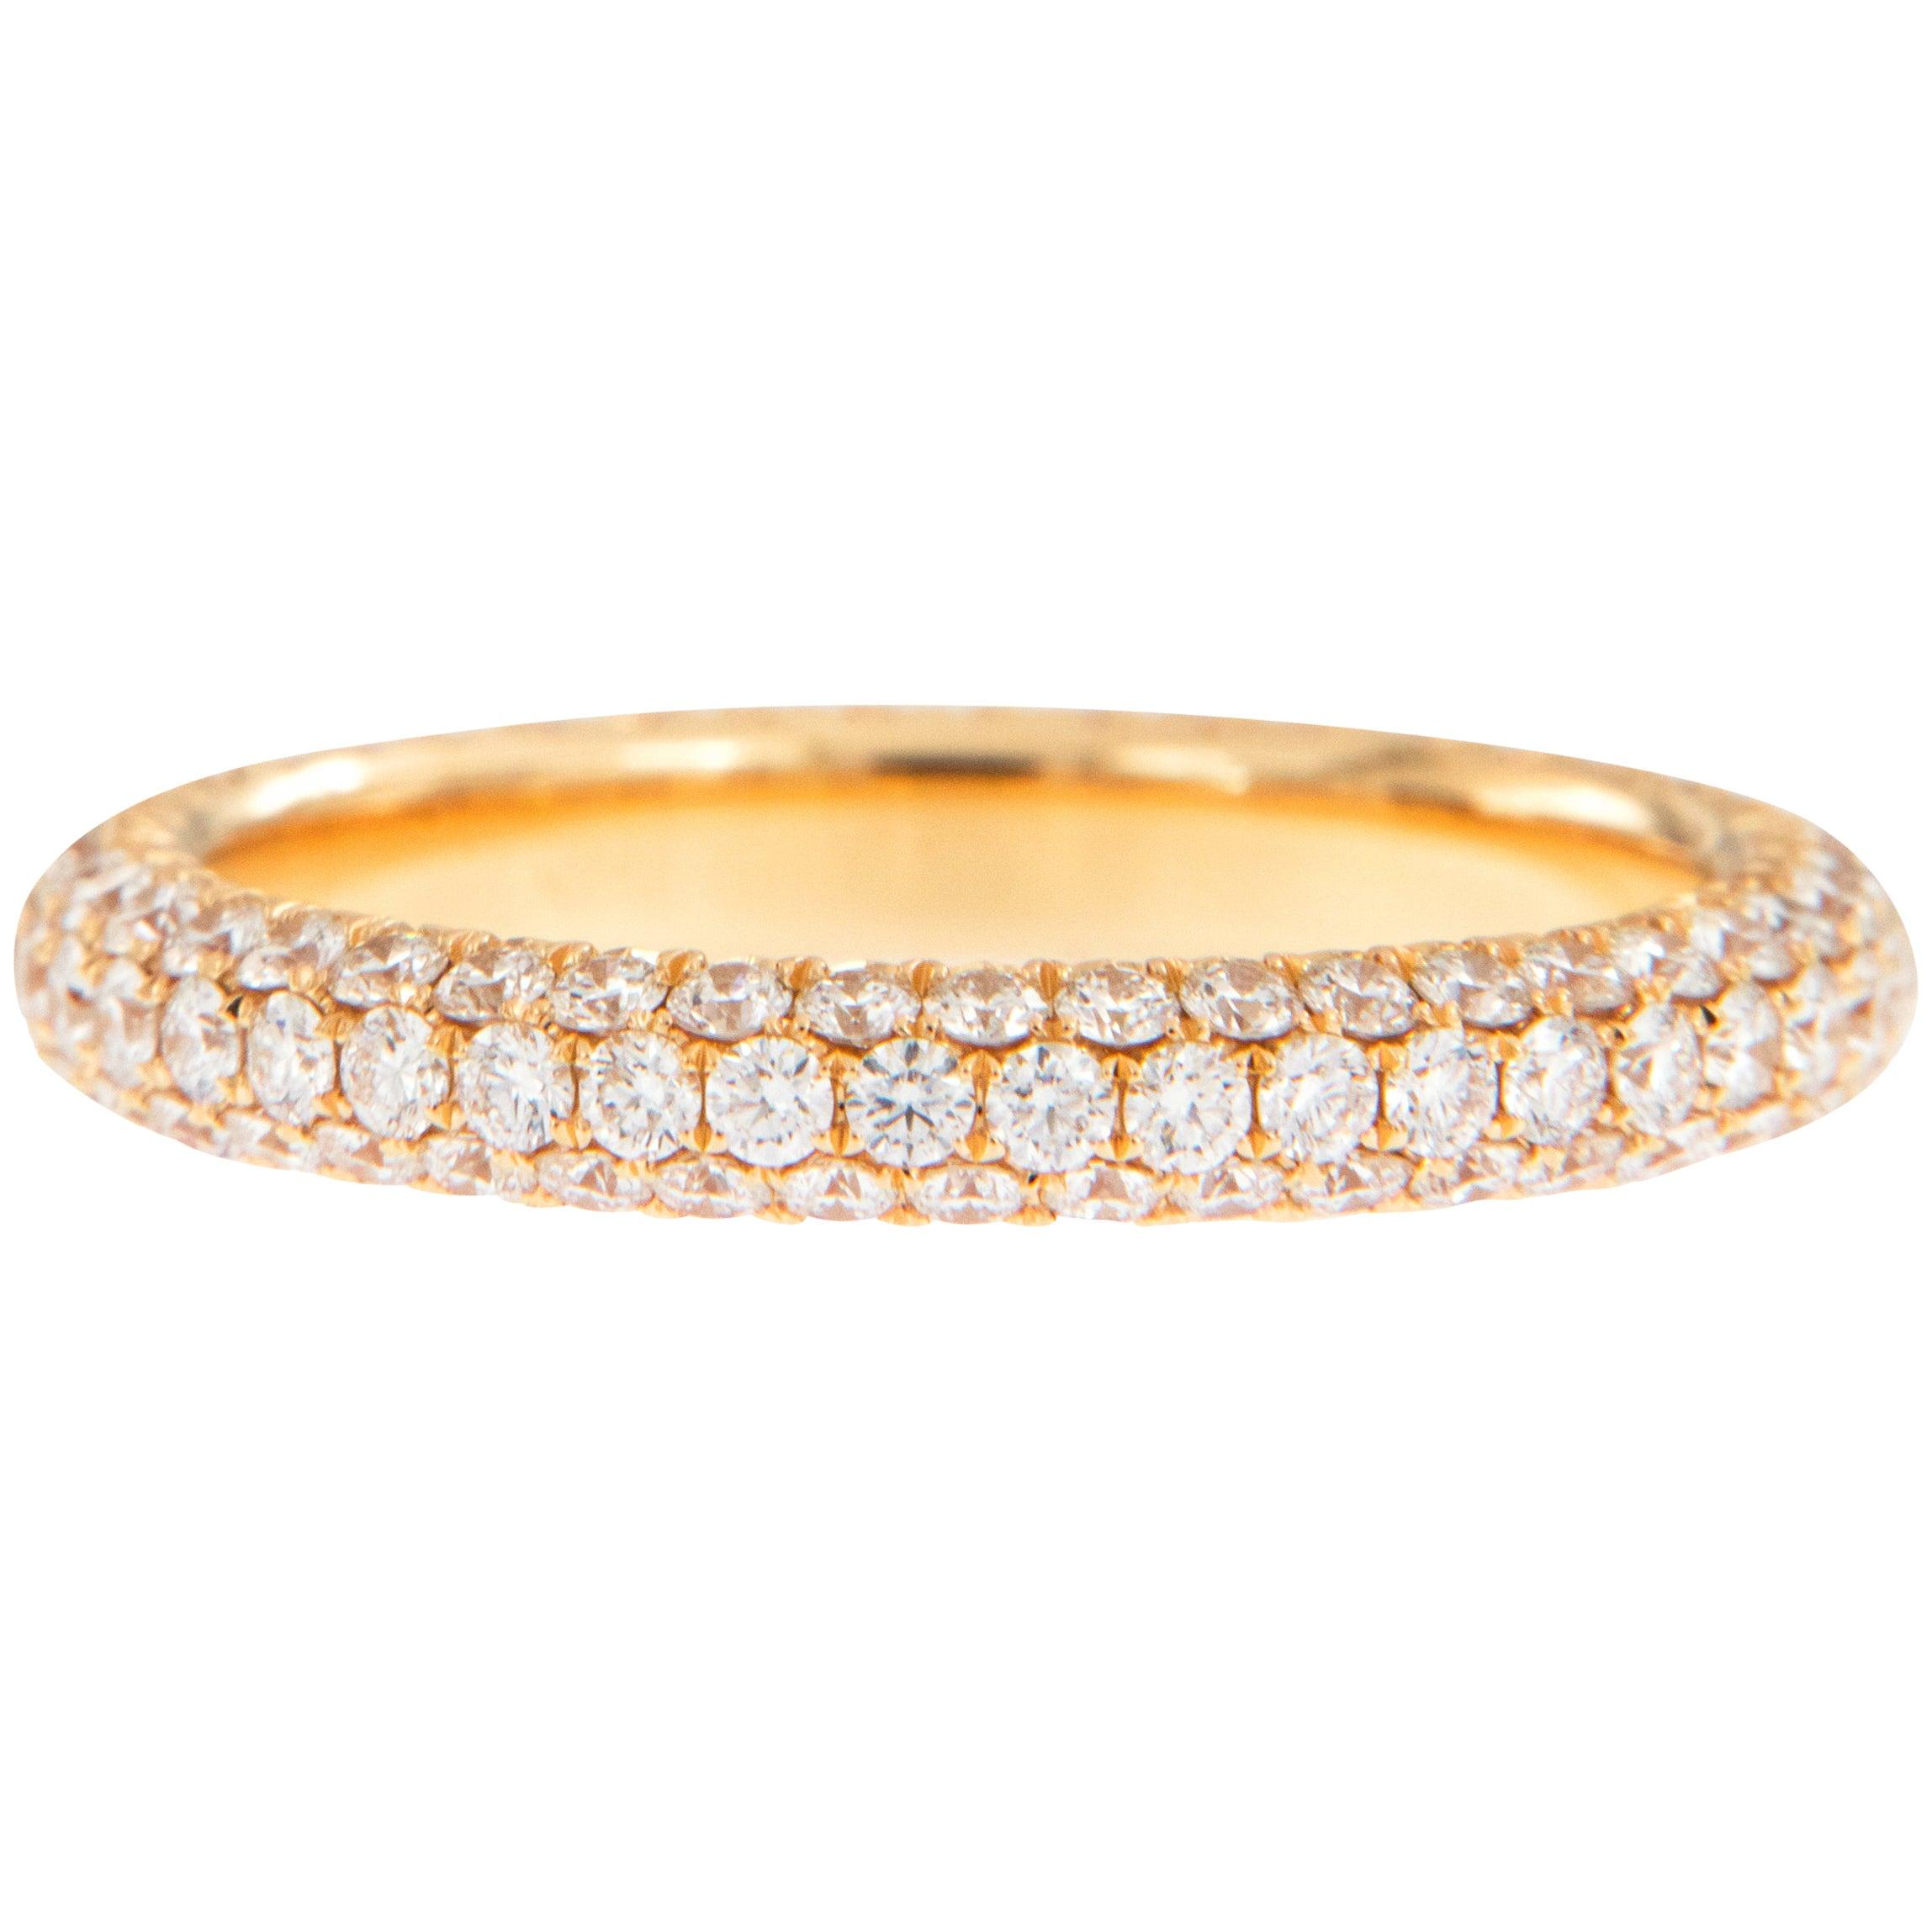 William Rosenberg 18 Karat Rose Gold 1.51 Carat Pave' Diamond Eternity Ring